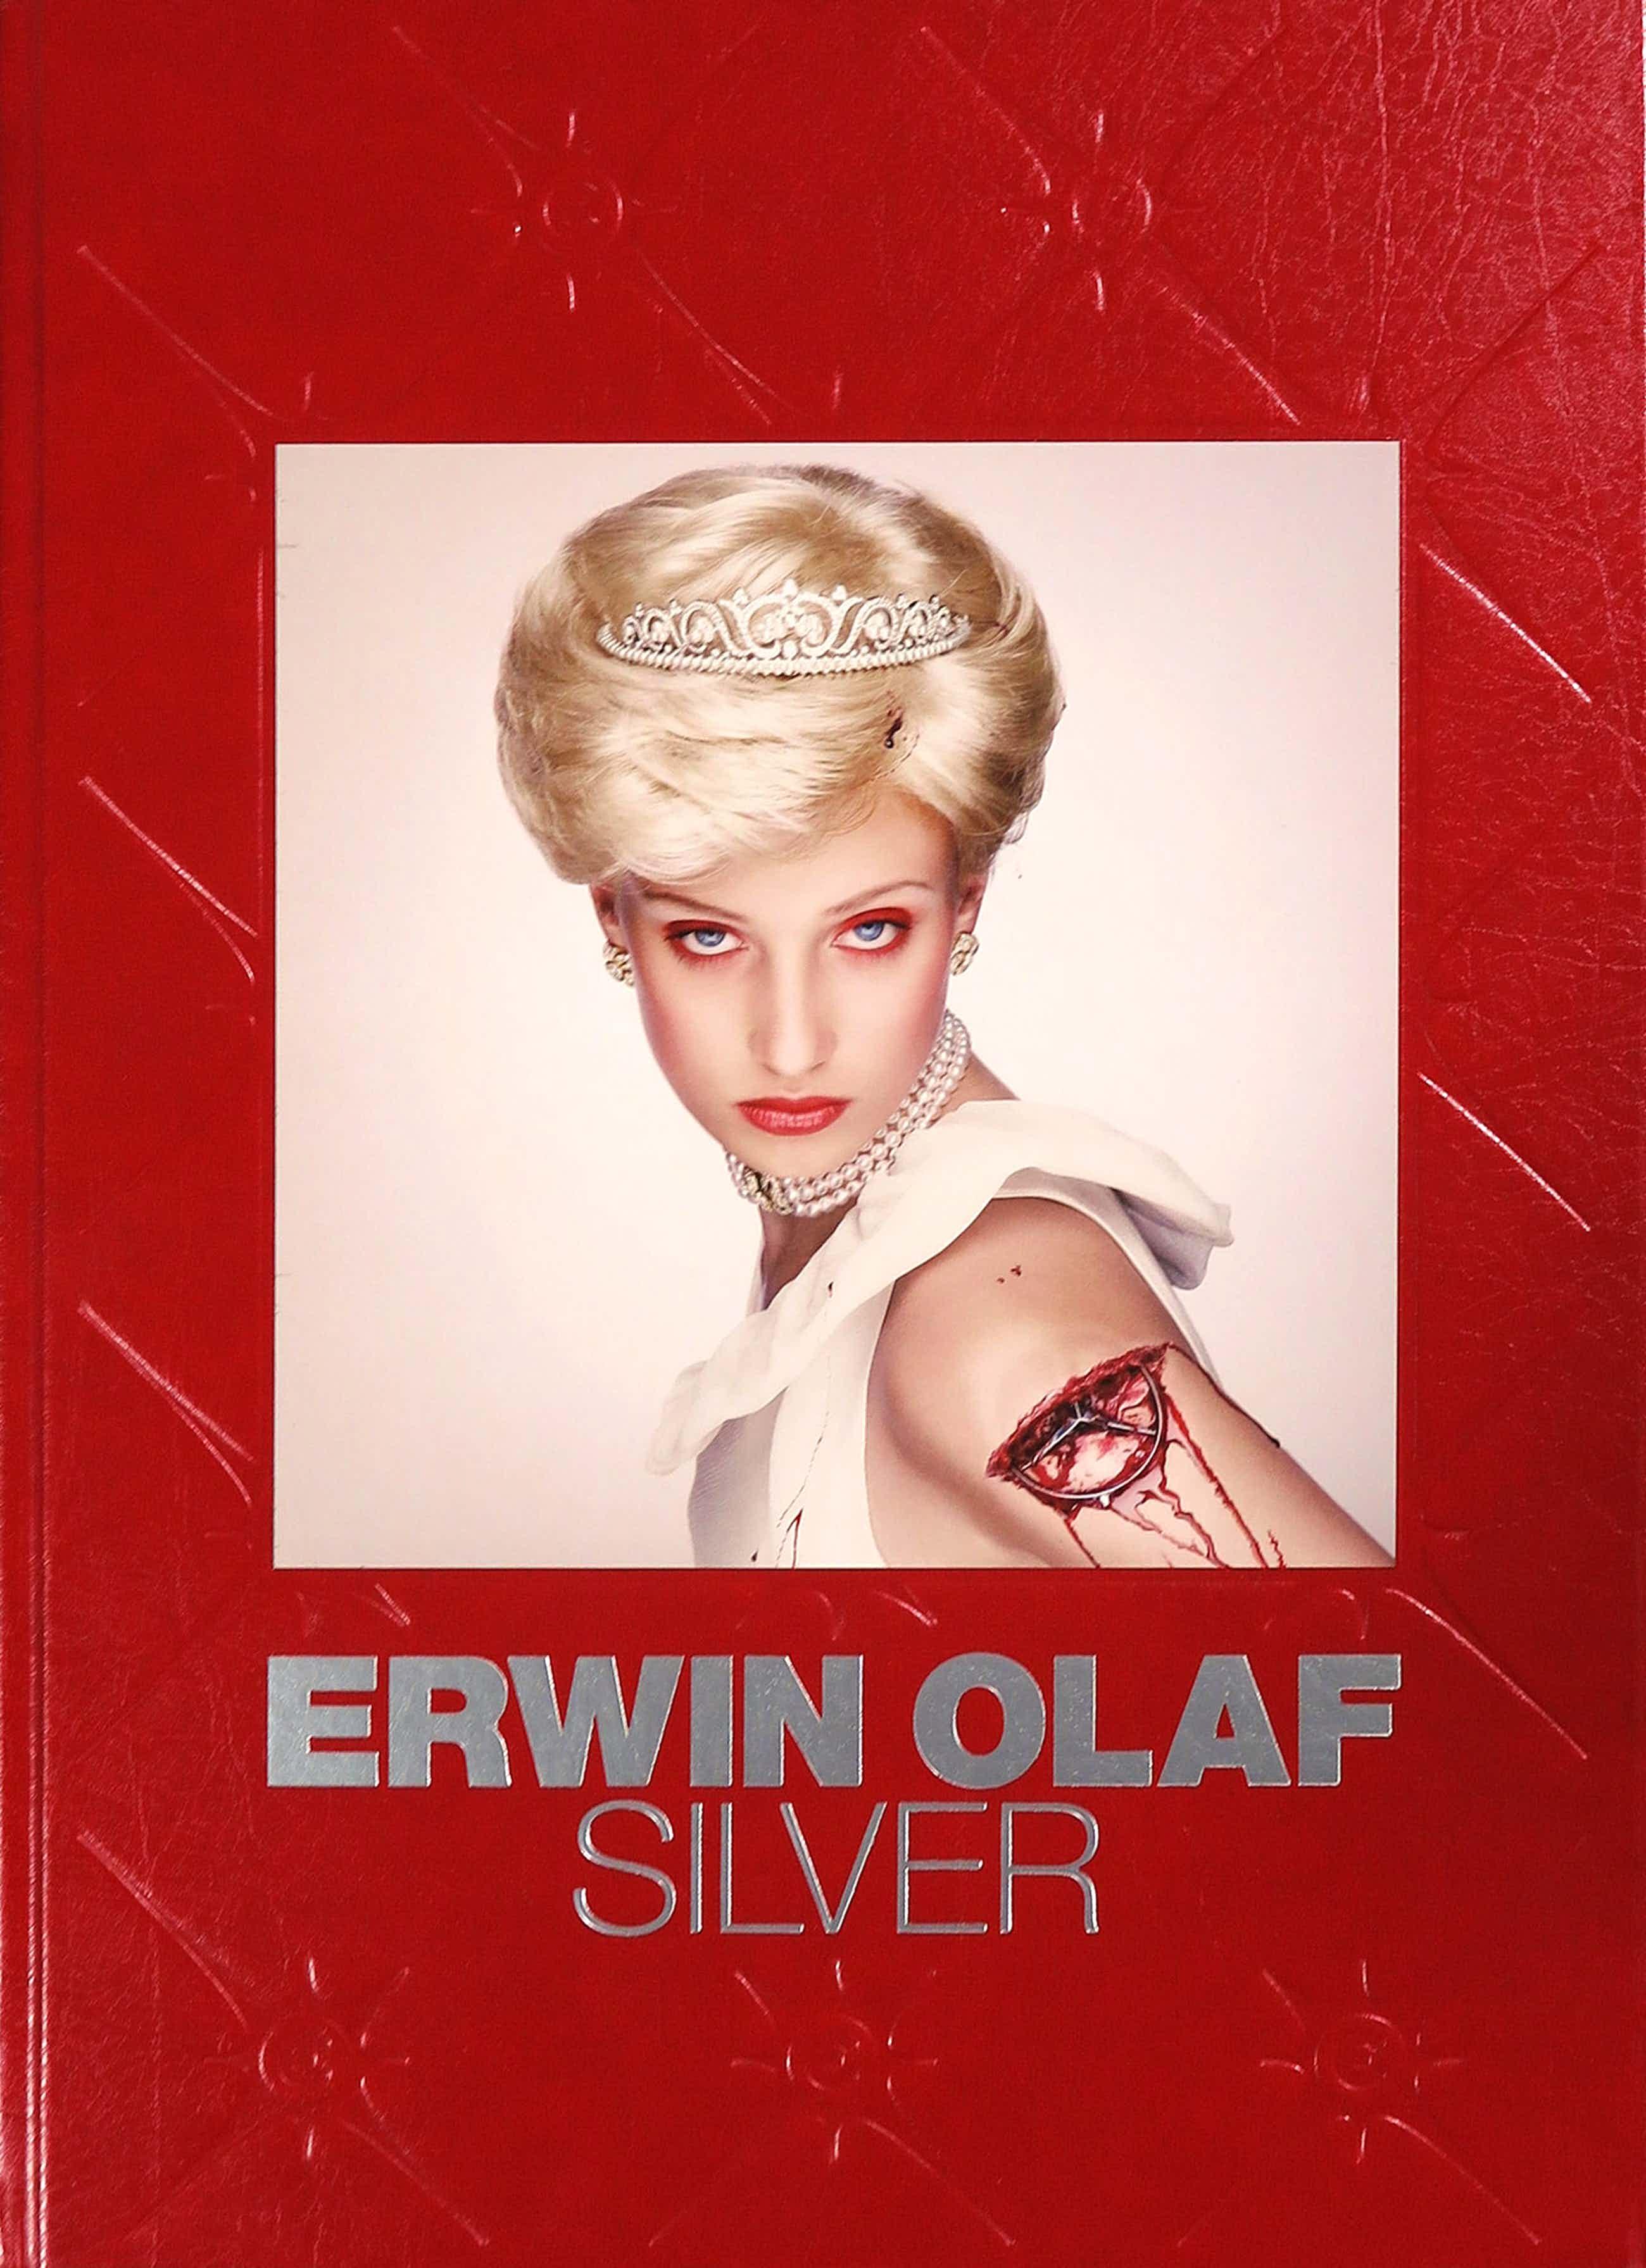 Erwin Olaf - Fotoboek, Silver (Gesigneerd) kopen? Bied vanaf 190!